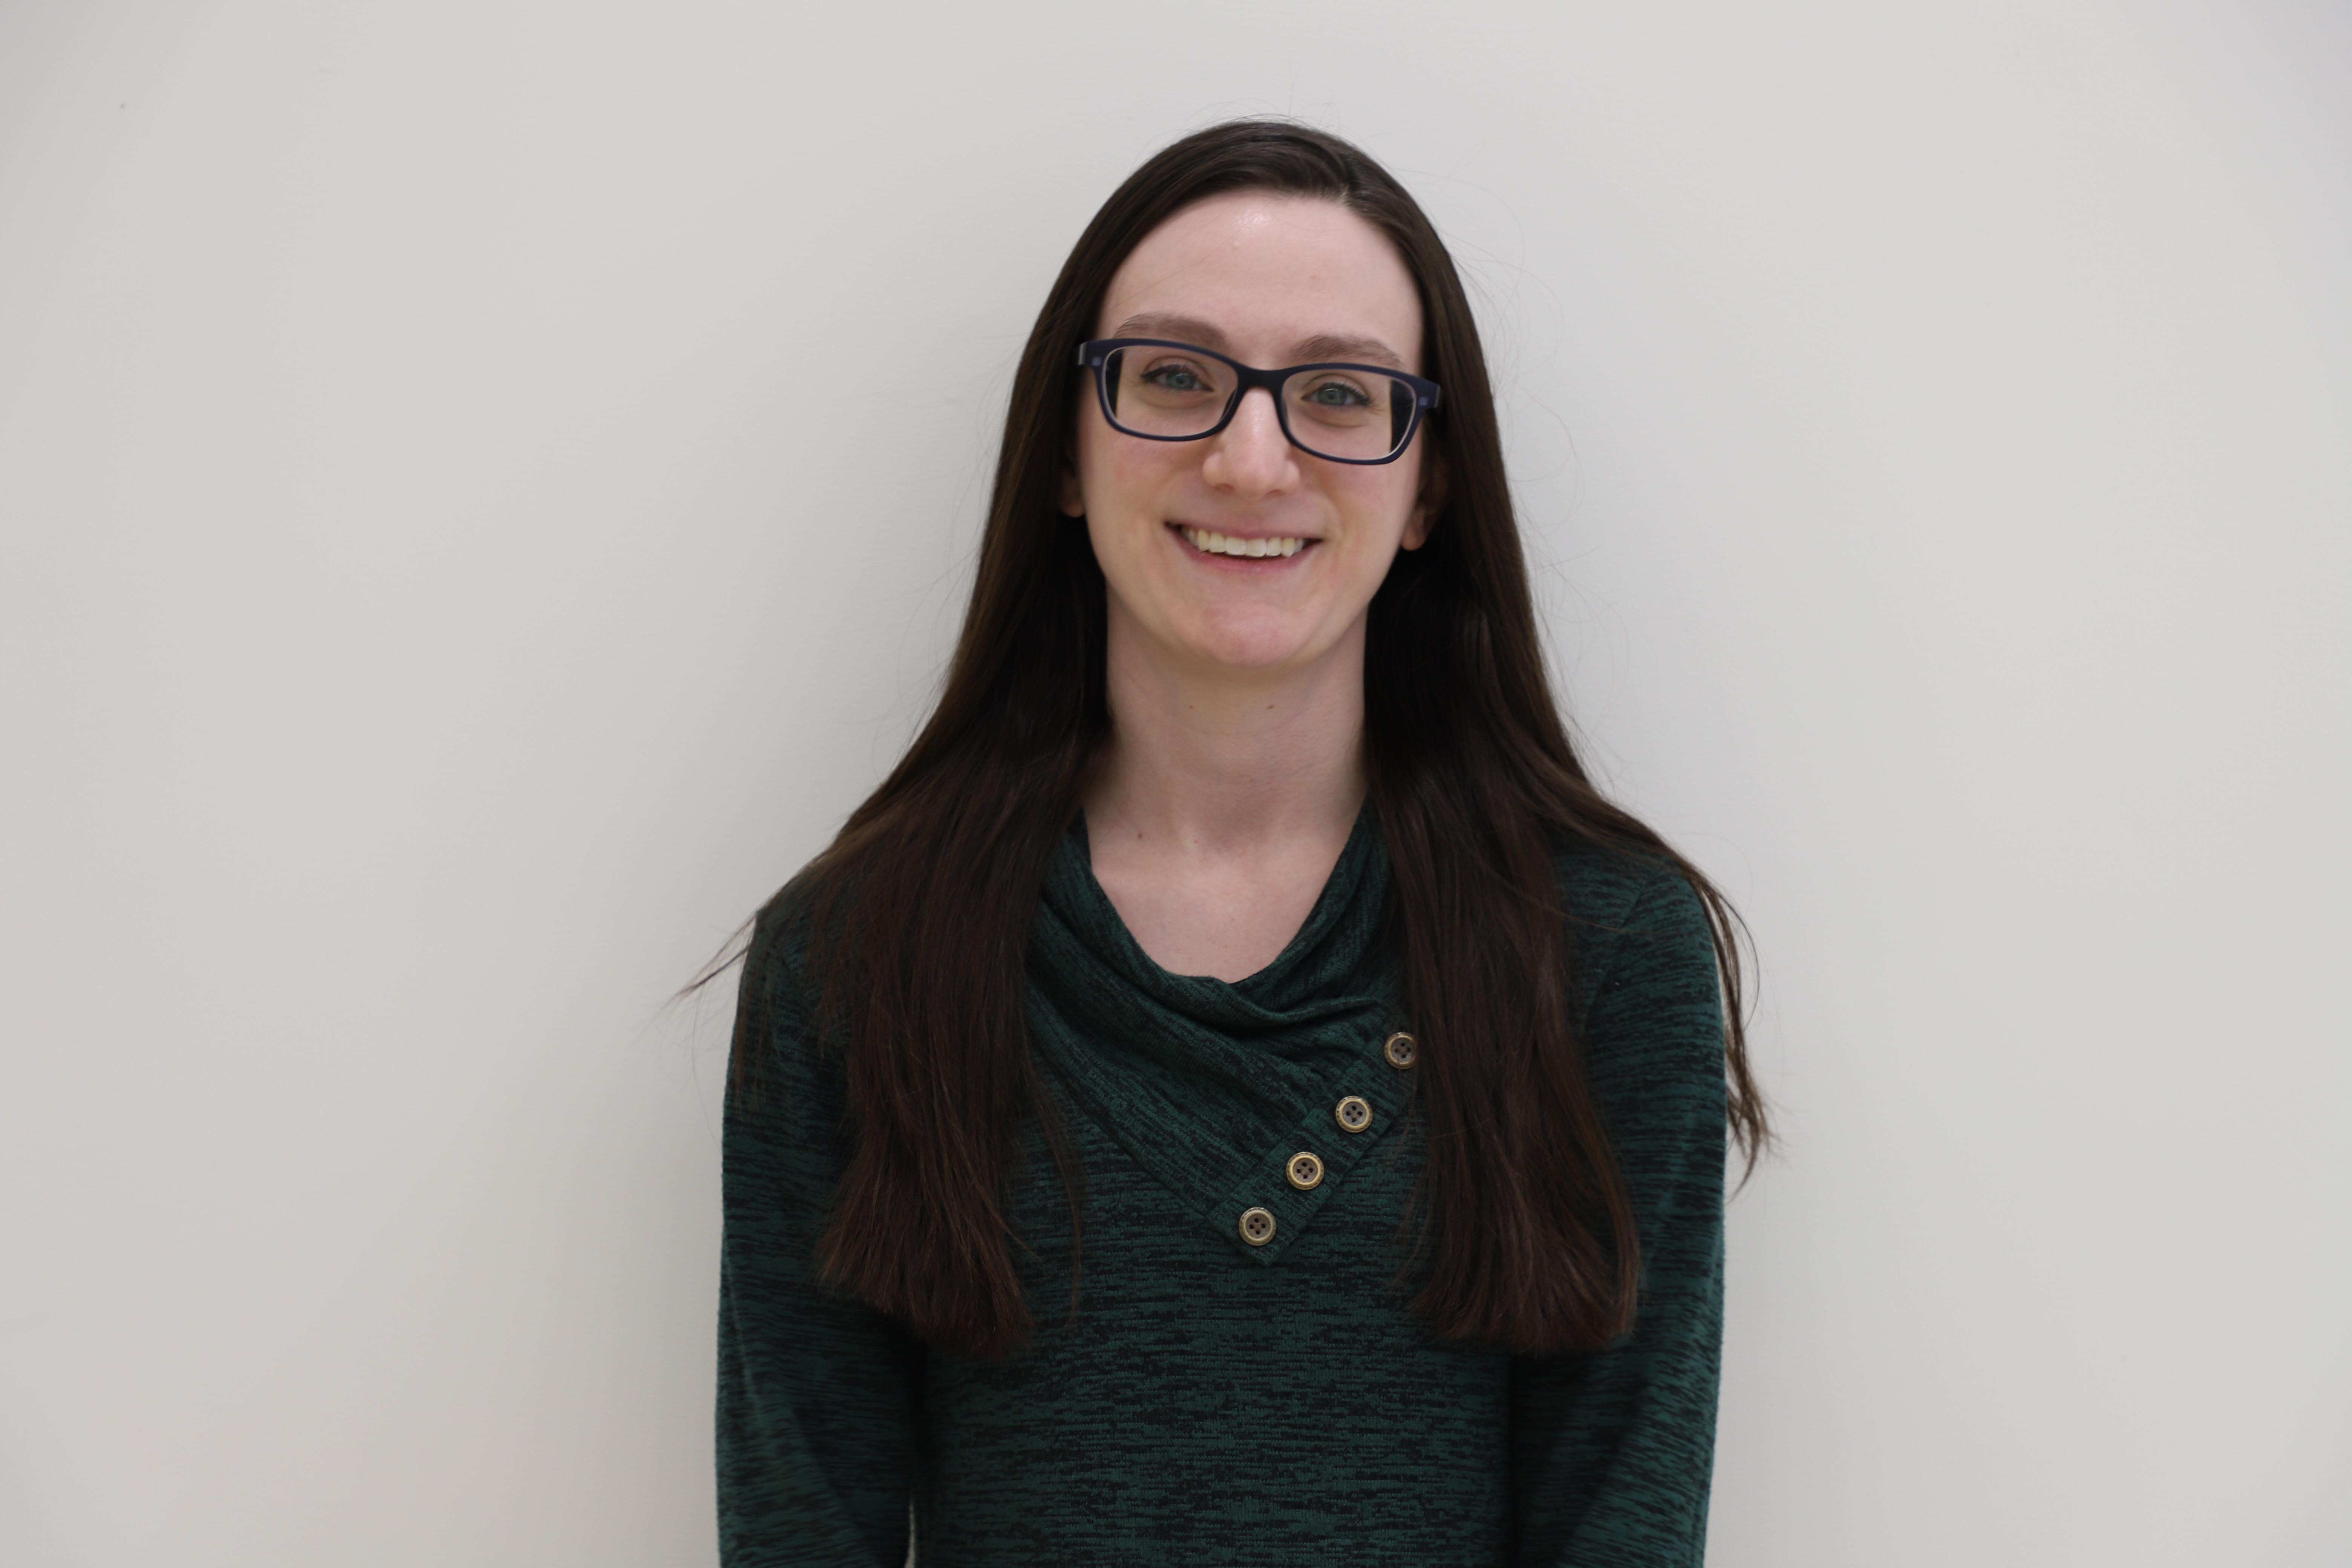 Deanna O'Shea - Human Resources Administrator